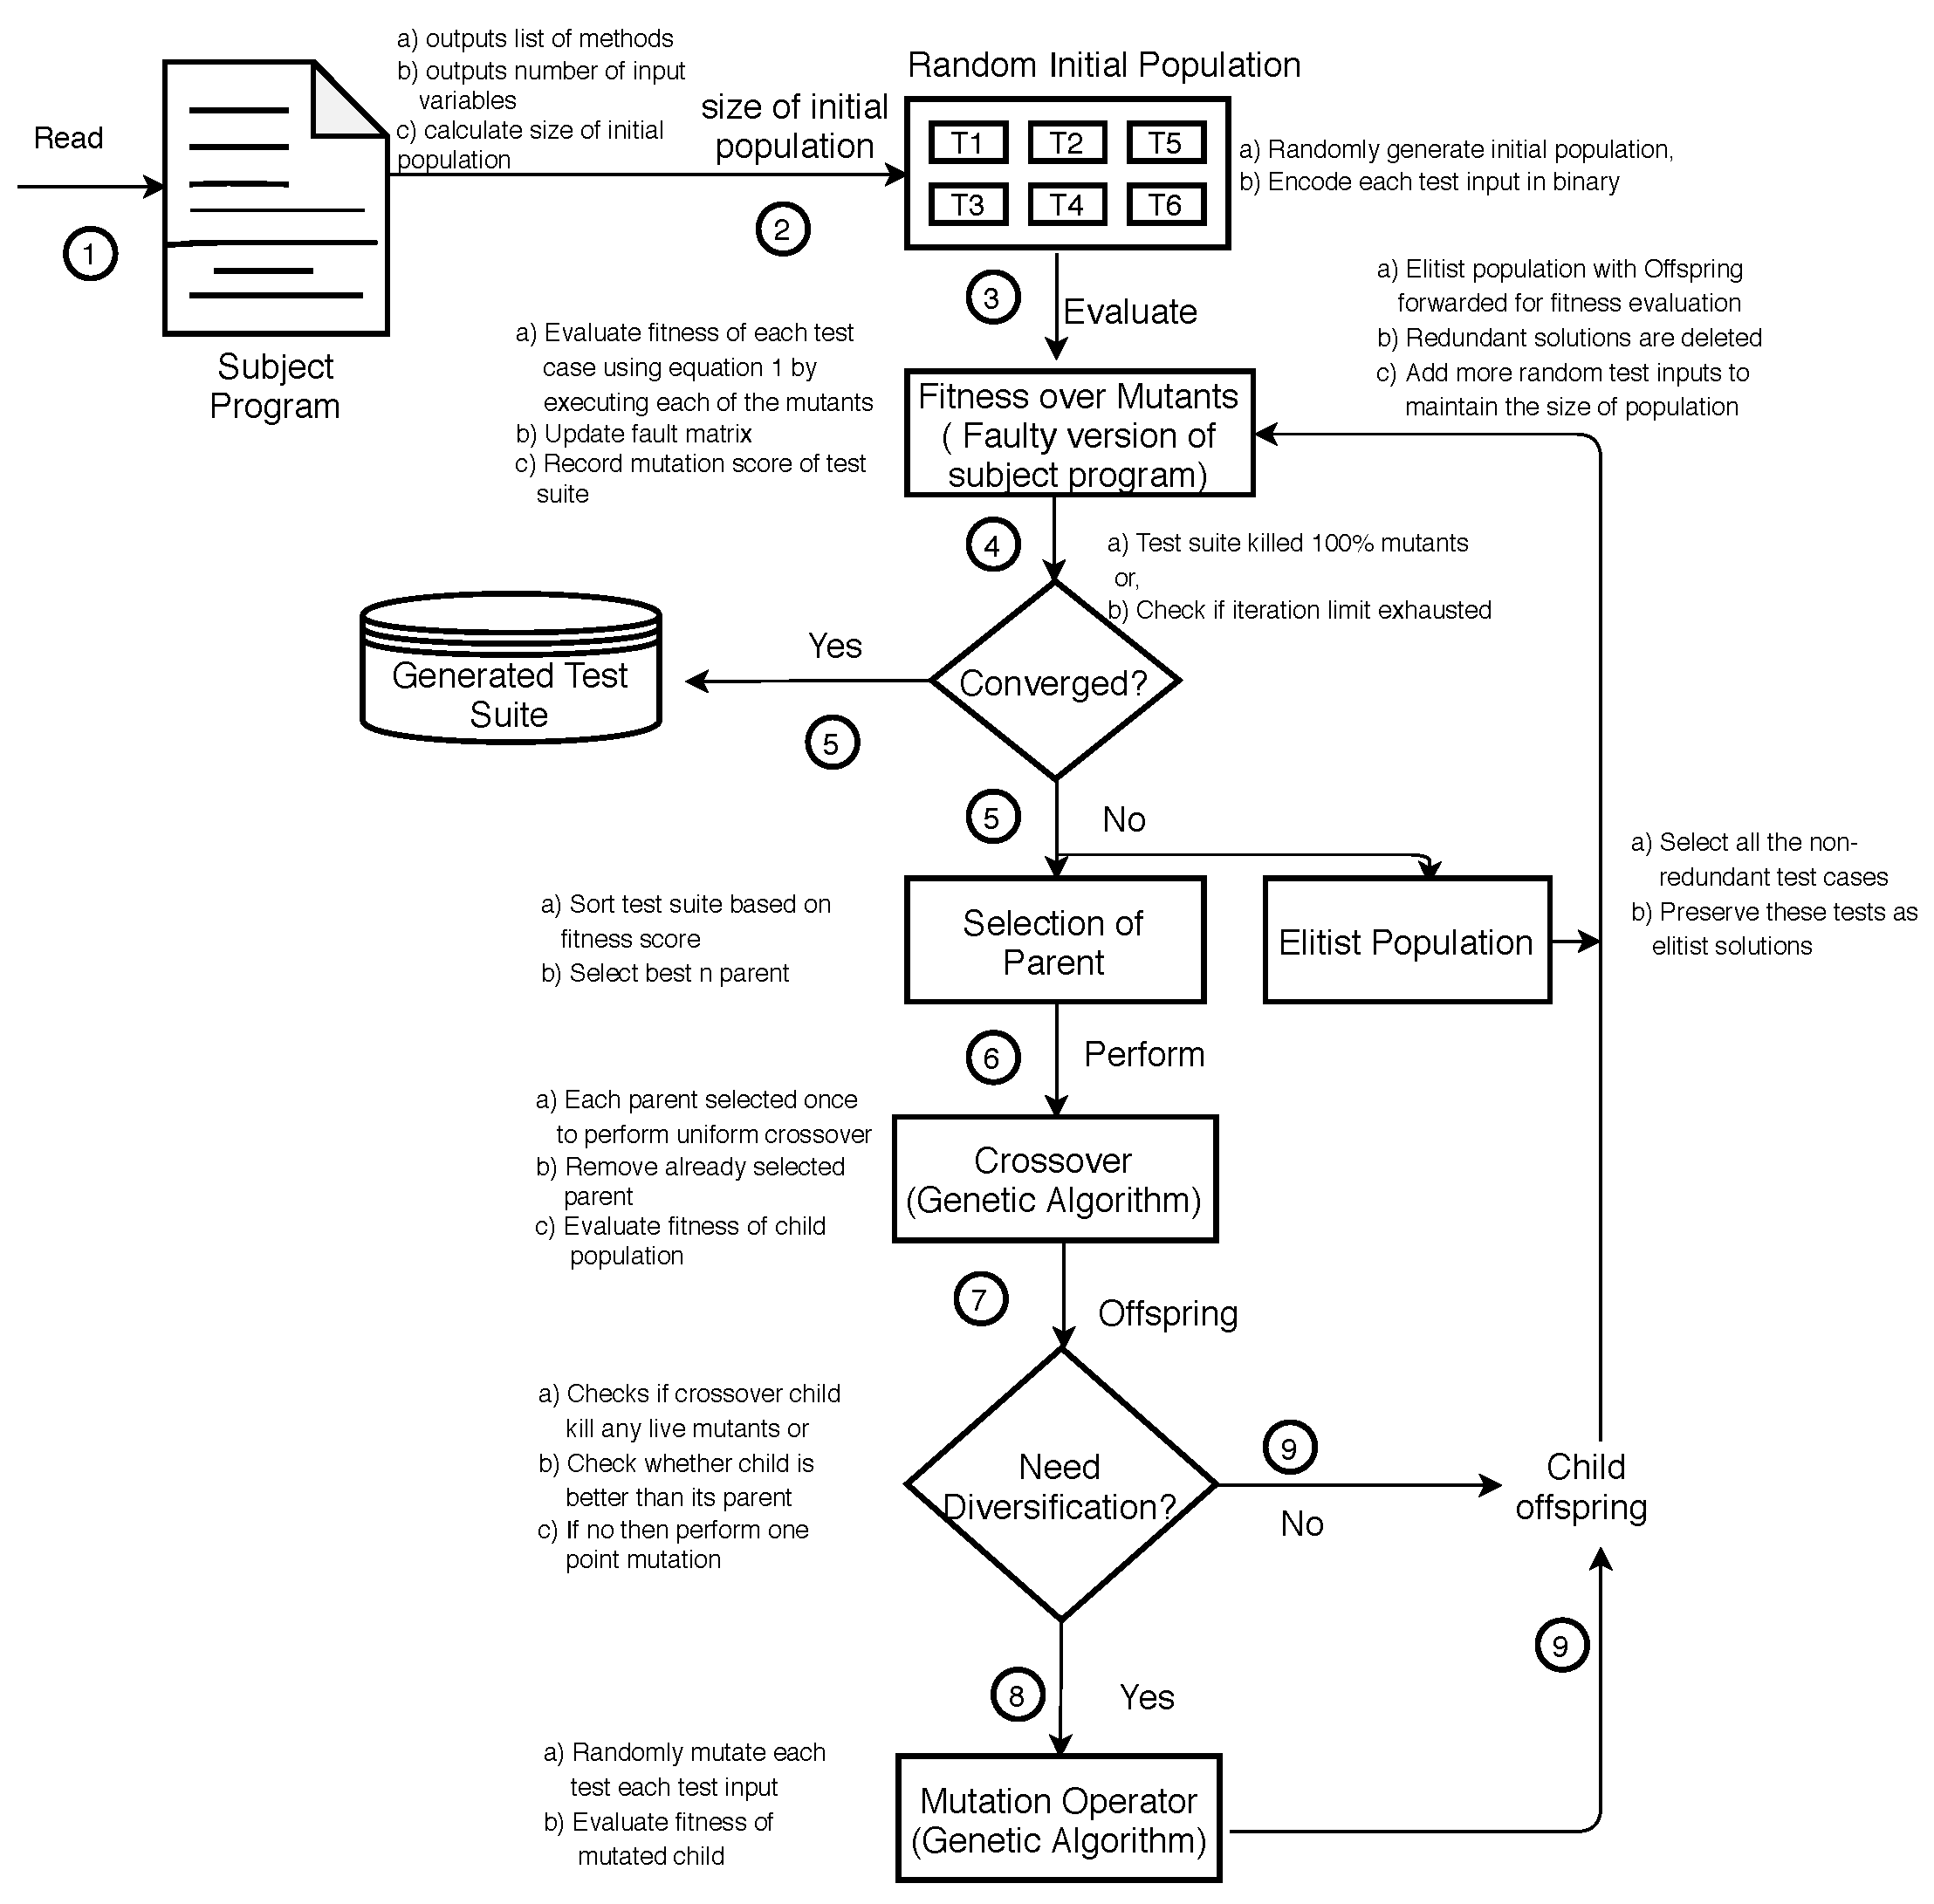 Symmetry Free Full Text On The Effectiveness Of Using Elitist Genetic Algorithm In Mutation Testing Html